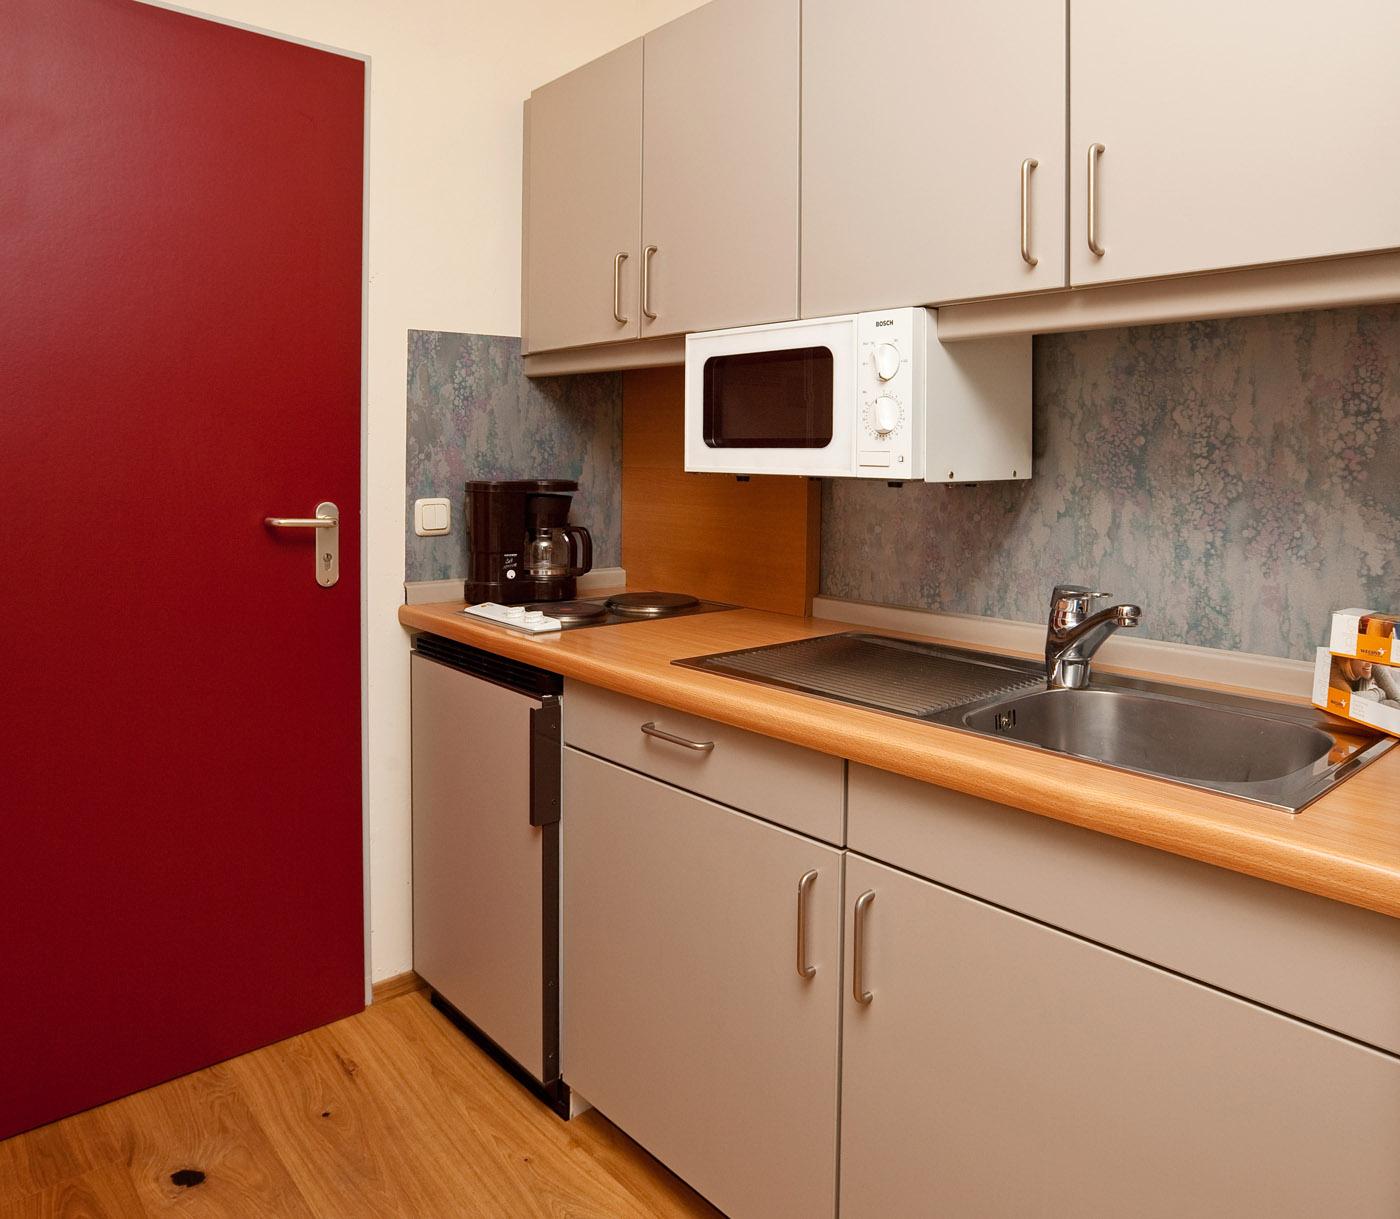 Kitchen in the 1-room-apartment at the aparthotel Seespitz in Füssen